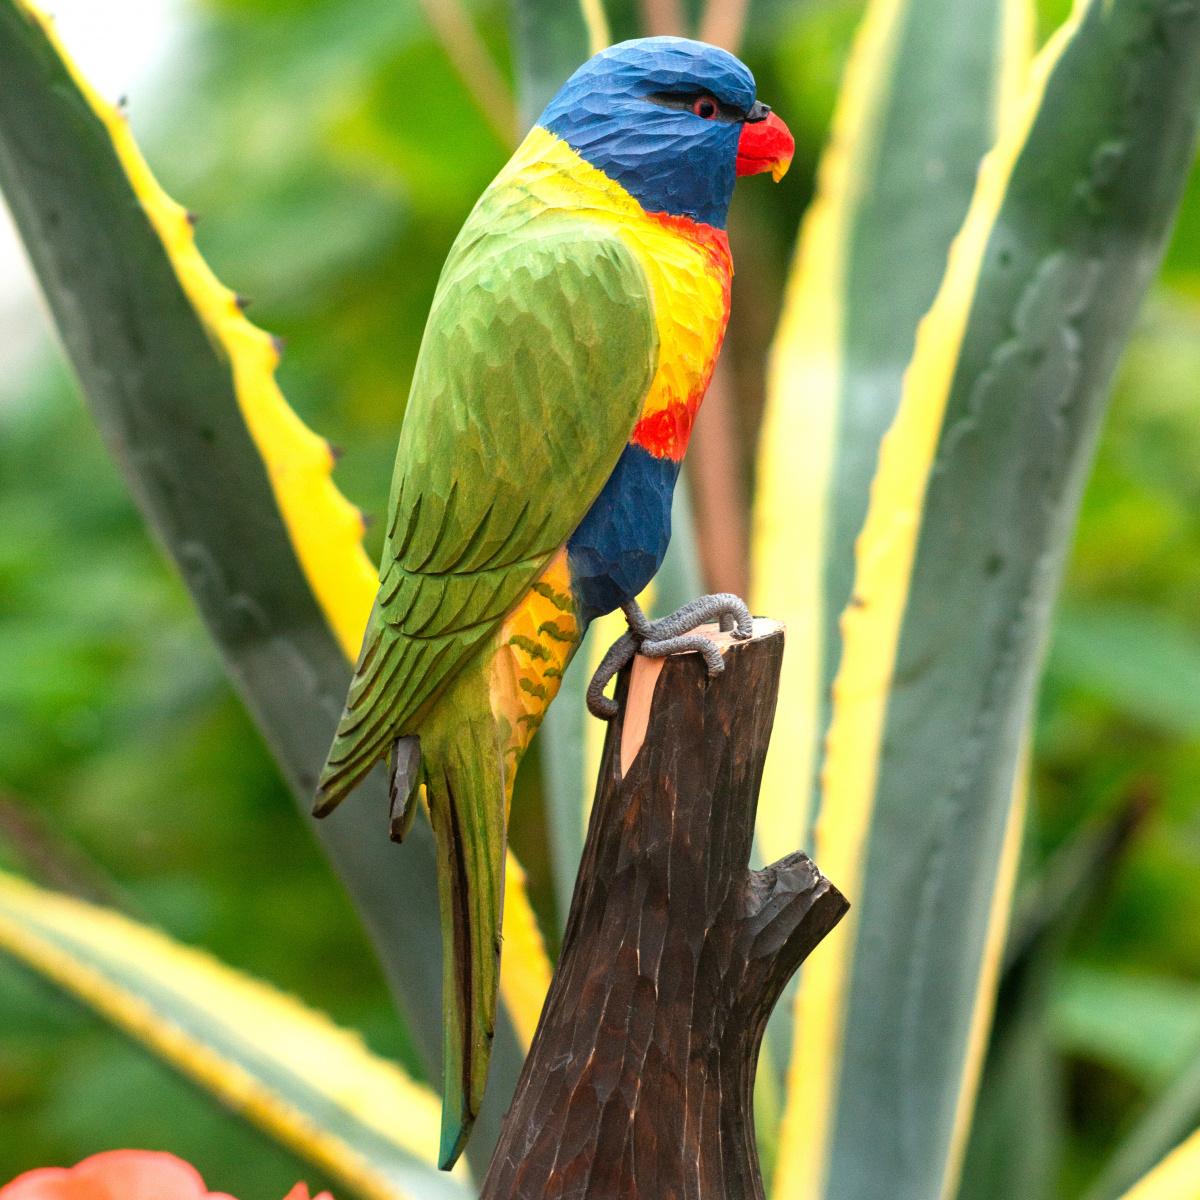 Wildlife Garden træfugl - regnbue lorikeet